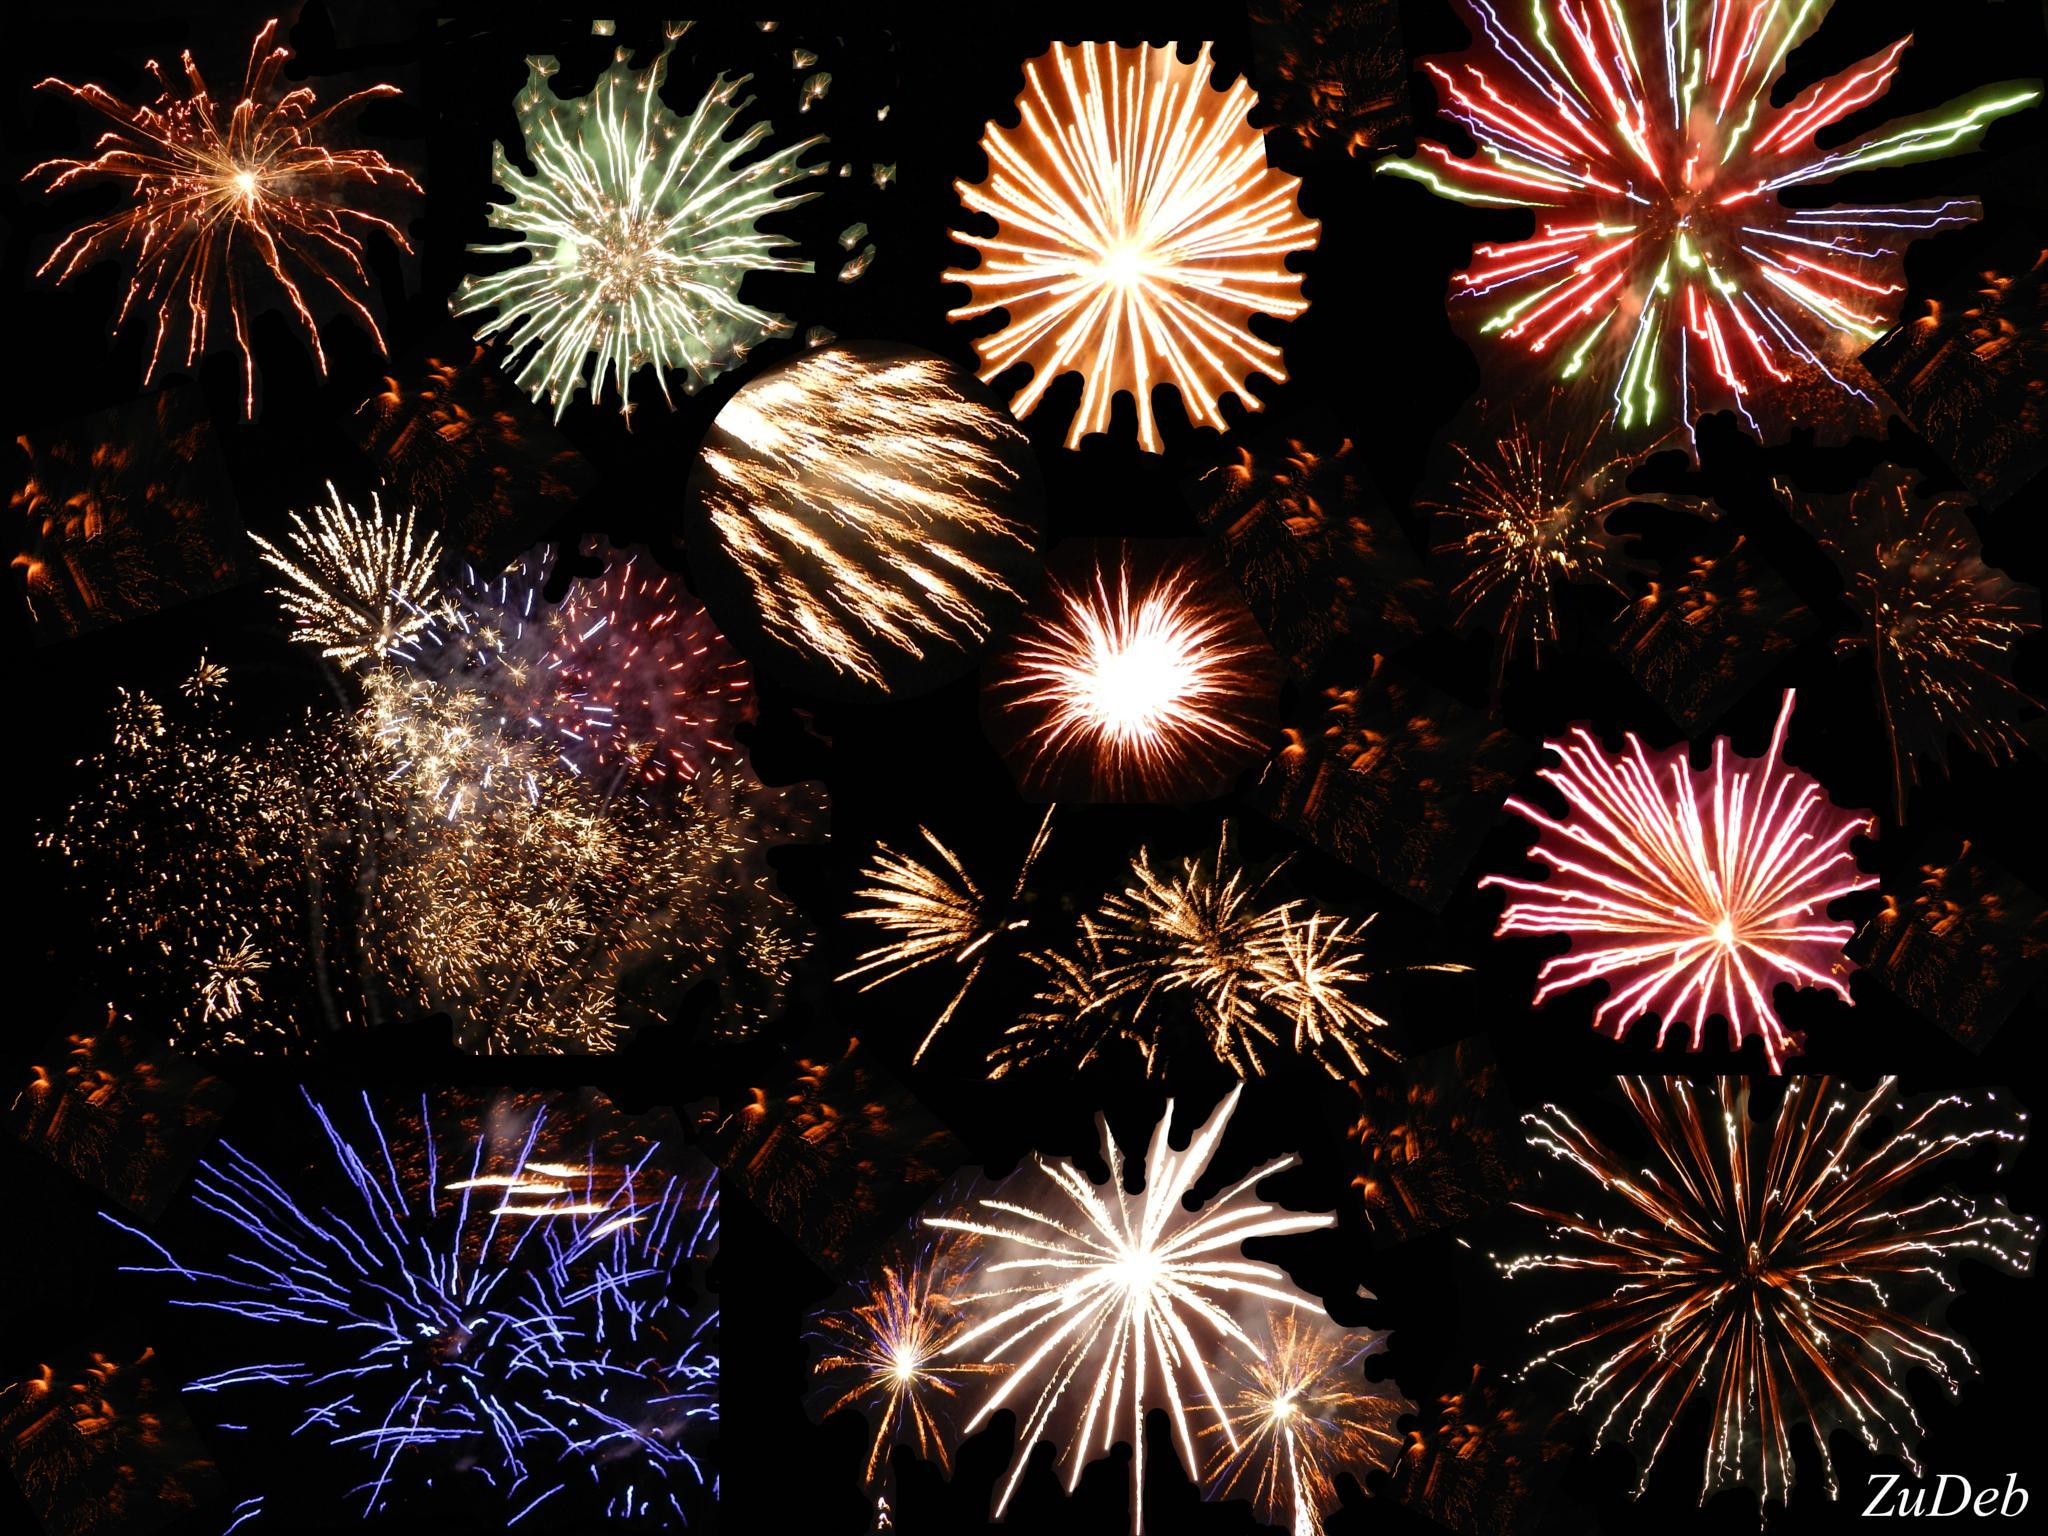 Fireworks by ZuDeb